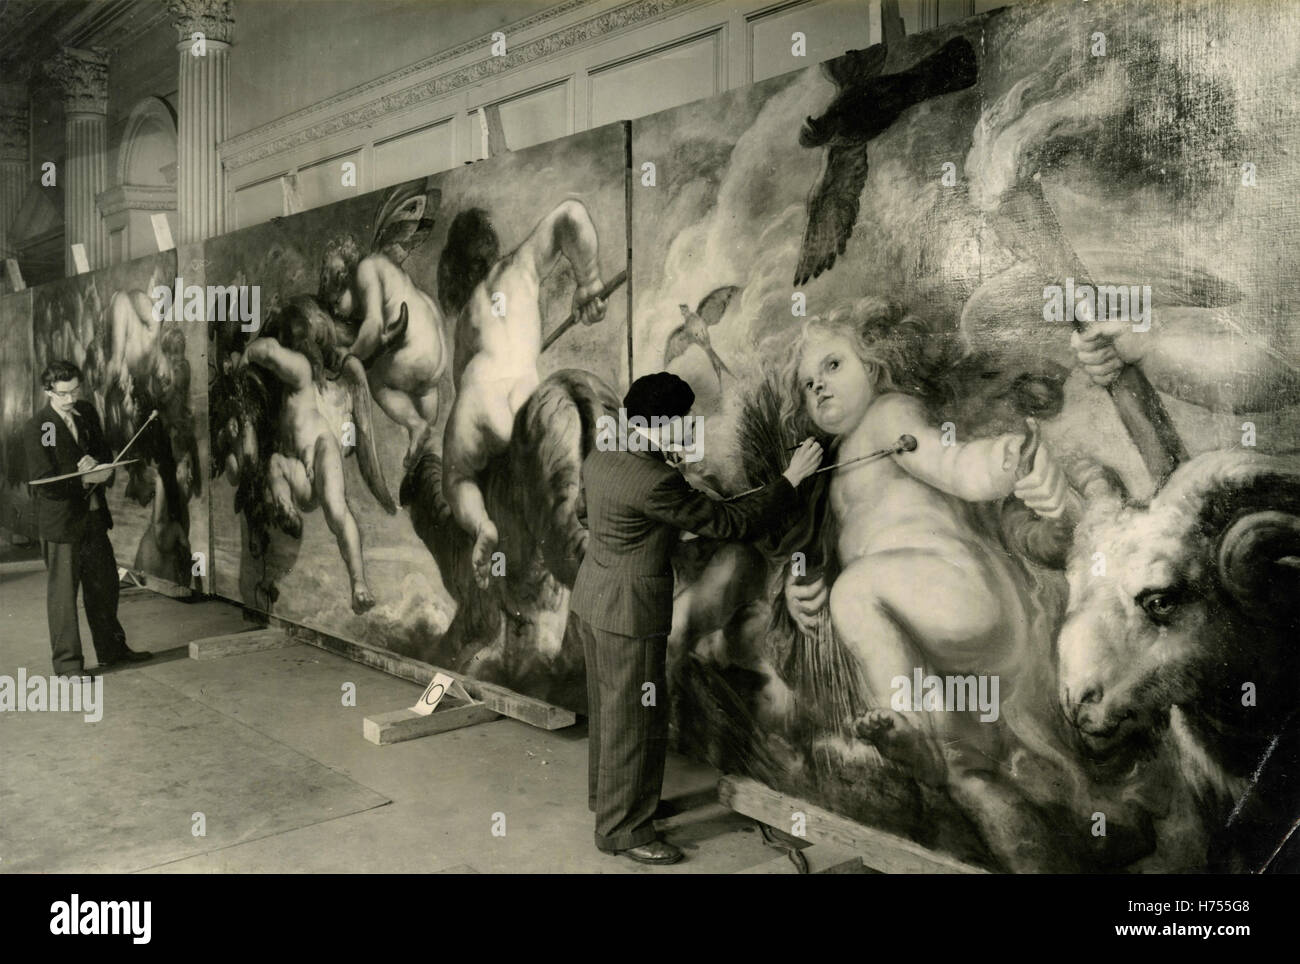 Restoration of panels painted by Peter Paul Rubens in Kensington Palace, London, UK - Stock Image